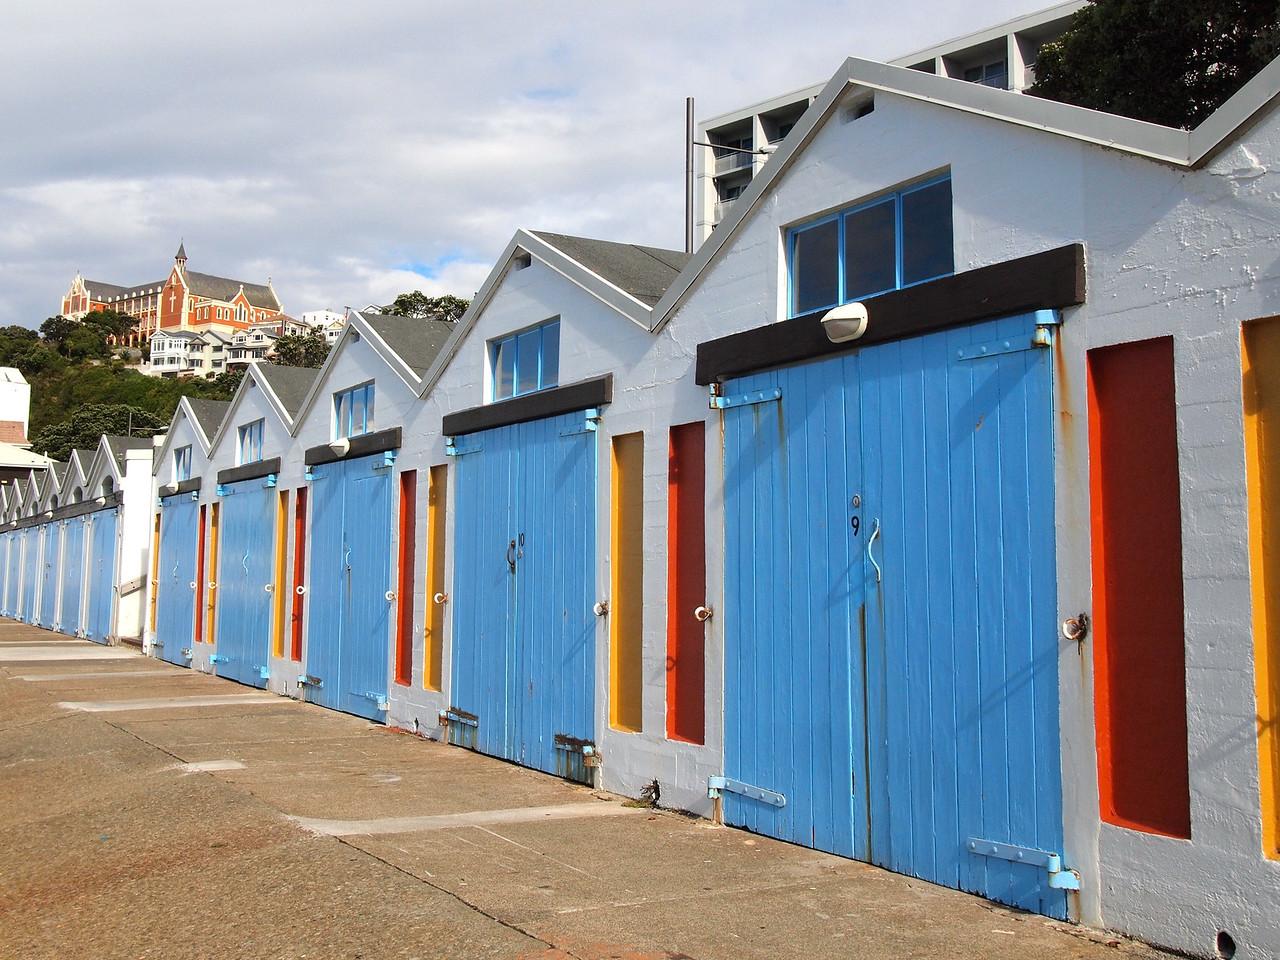 Boat houses in Wellington